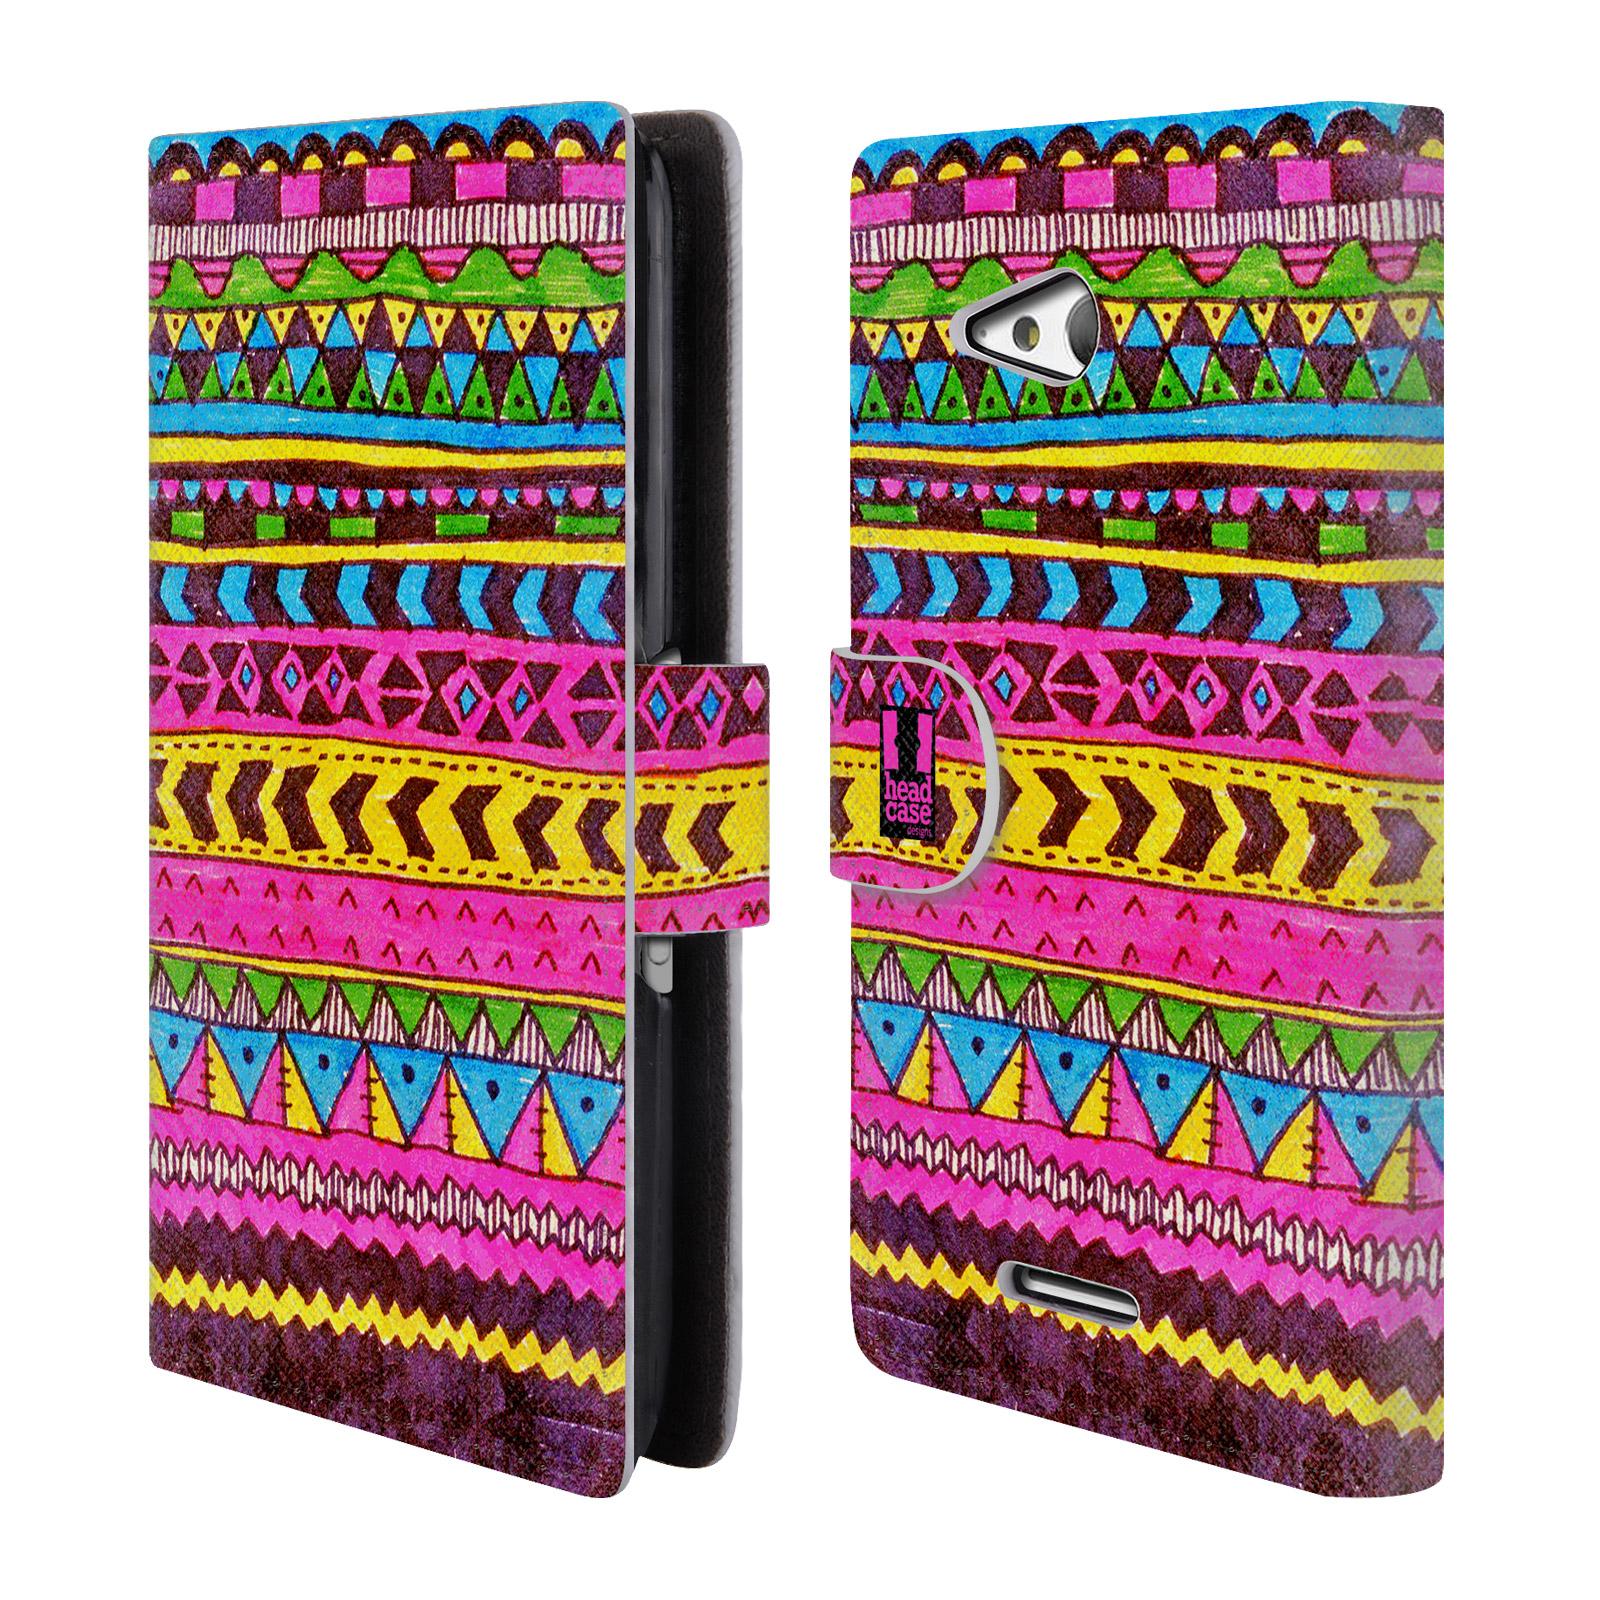 HEAD CASE Flipové pouzdro pro mobil SONY XPERIA E4g Barevná aztécká čmáranice růžová